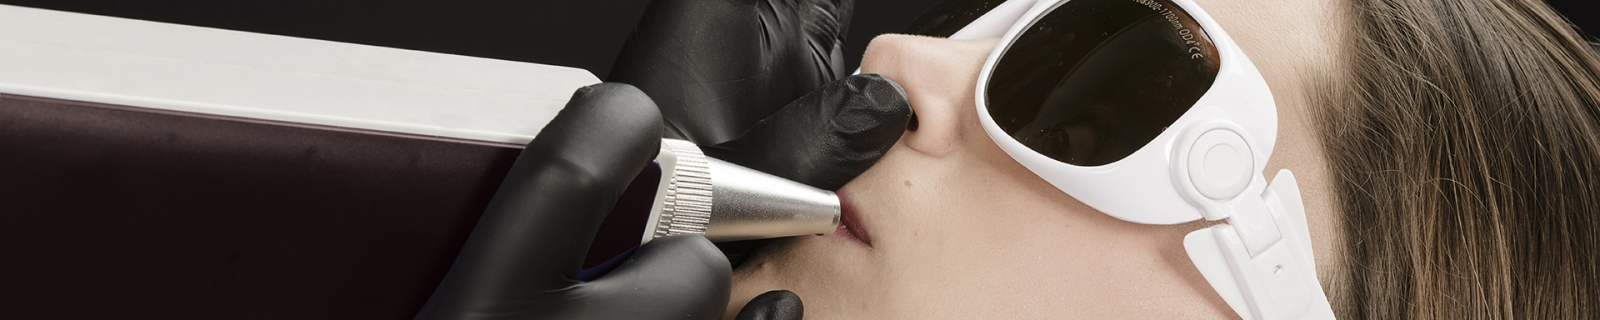 laserowe usuwanie makijażu tatuażu